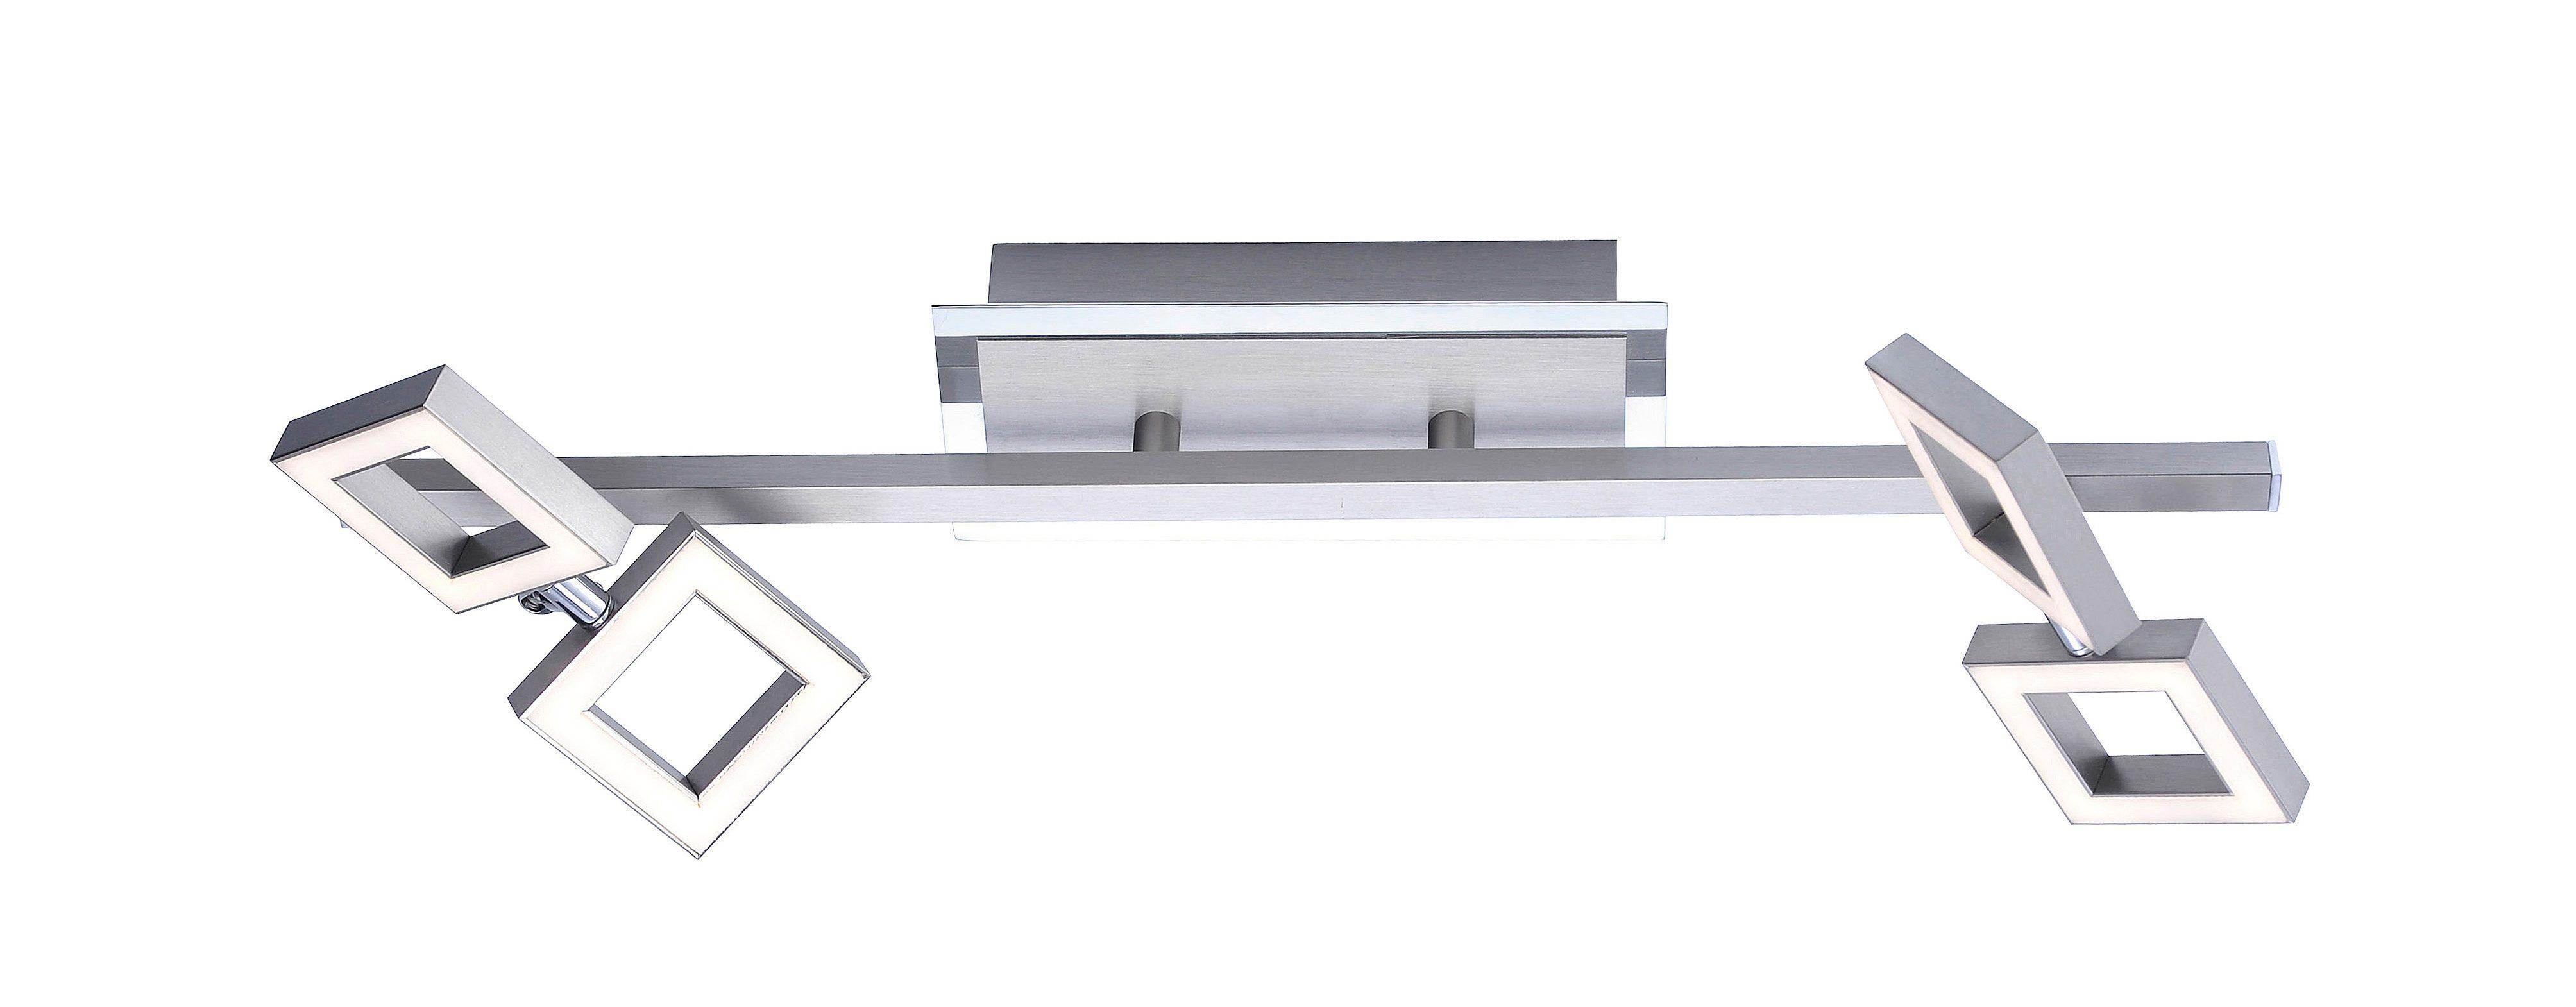 Paul Neuhaus LED-Deckenleuchte, 4flg., »TWINS«